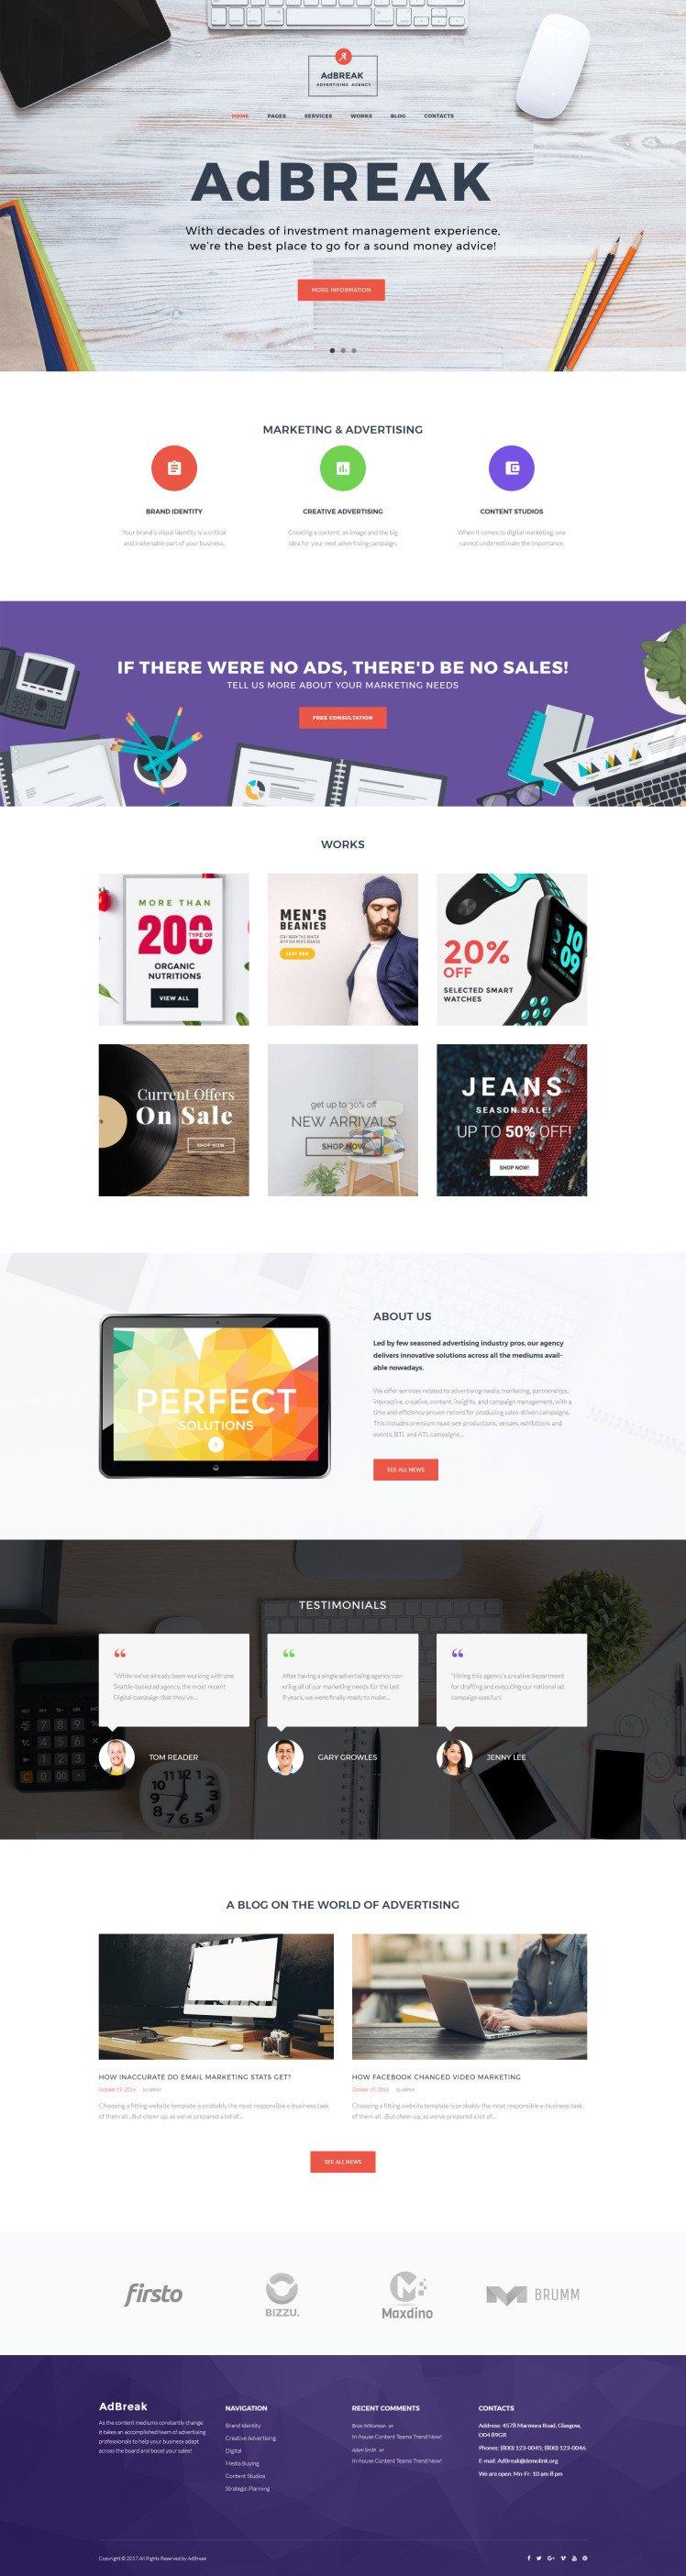 AdBreak Advertising Company WordPress Theme